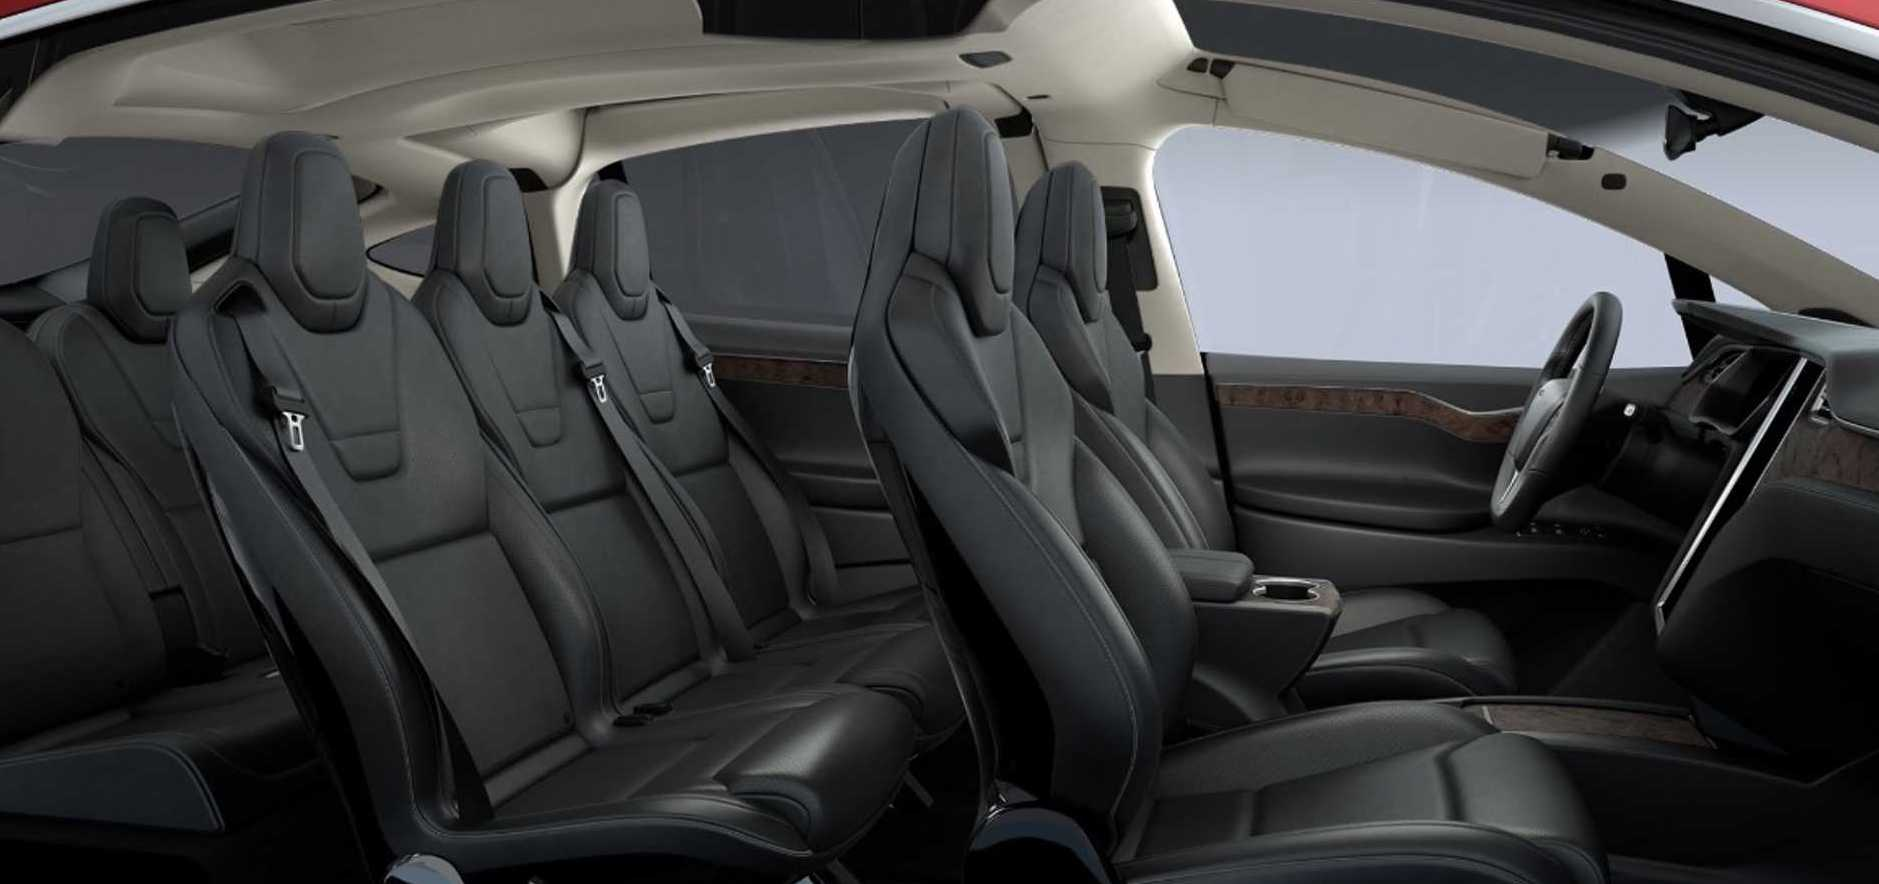 tesla-model-x-black-interior